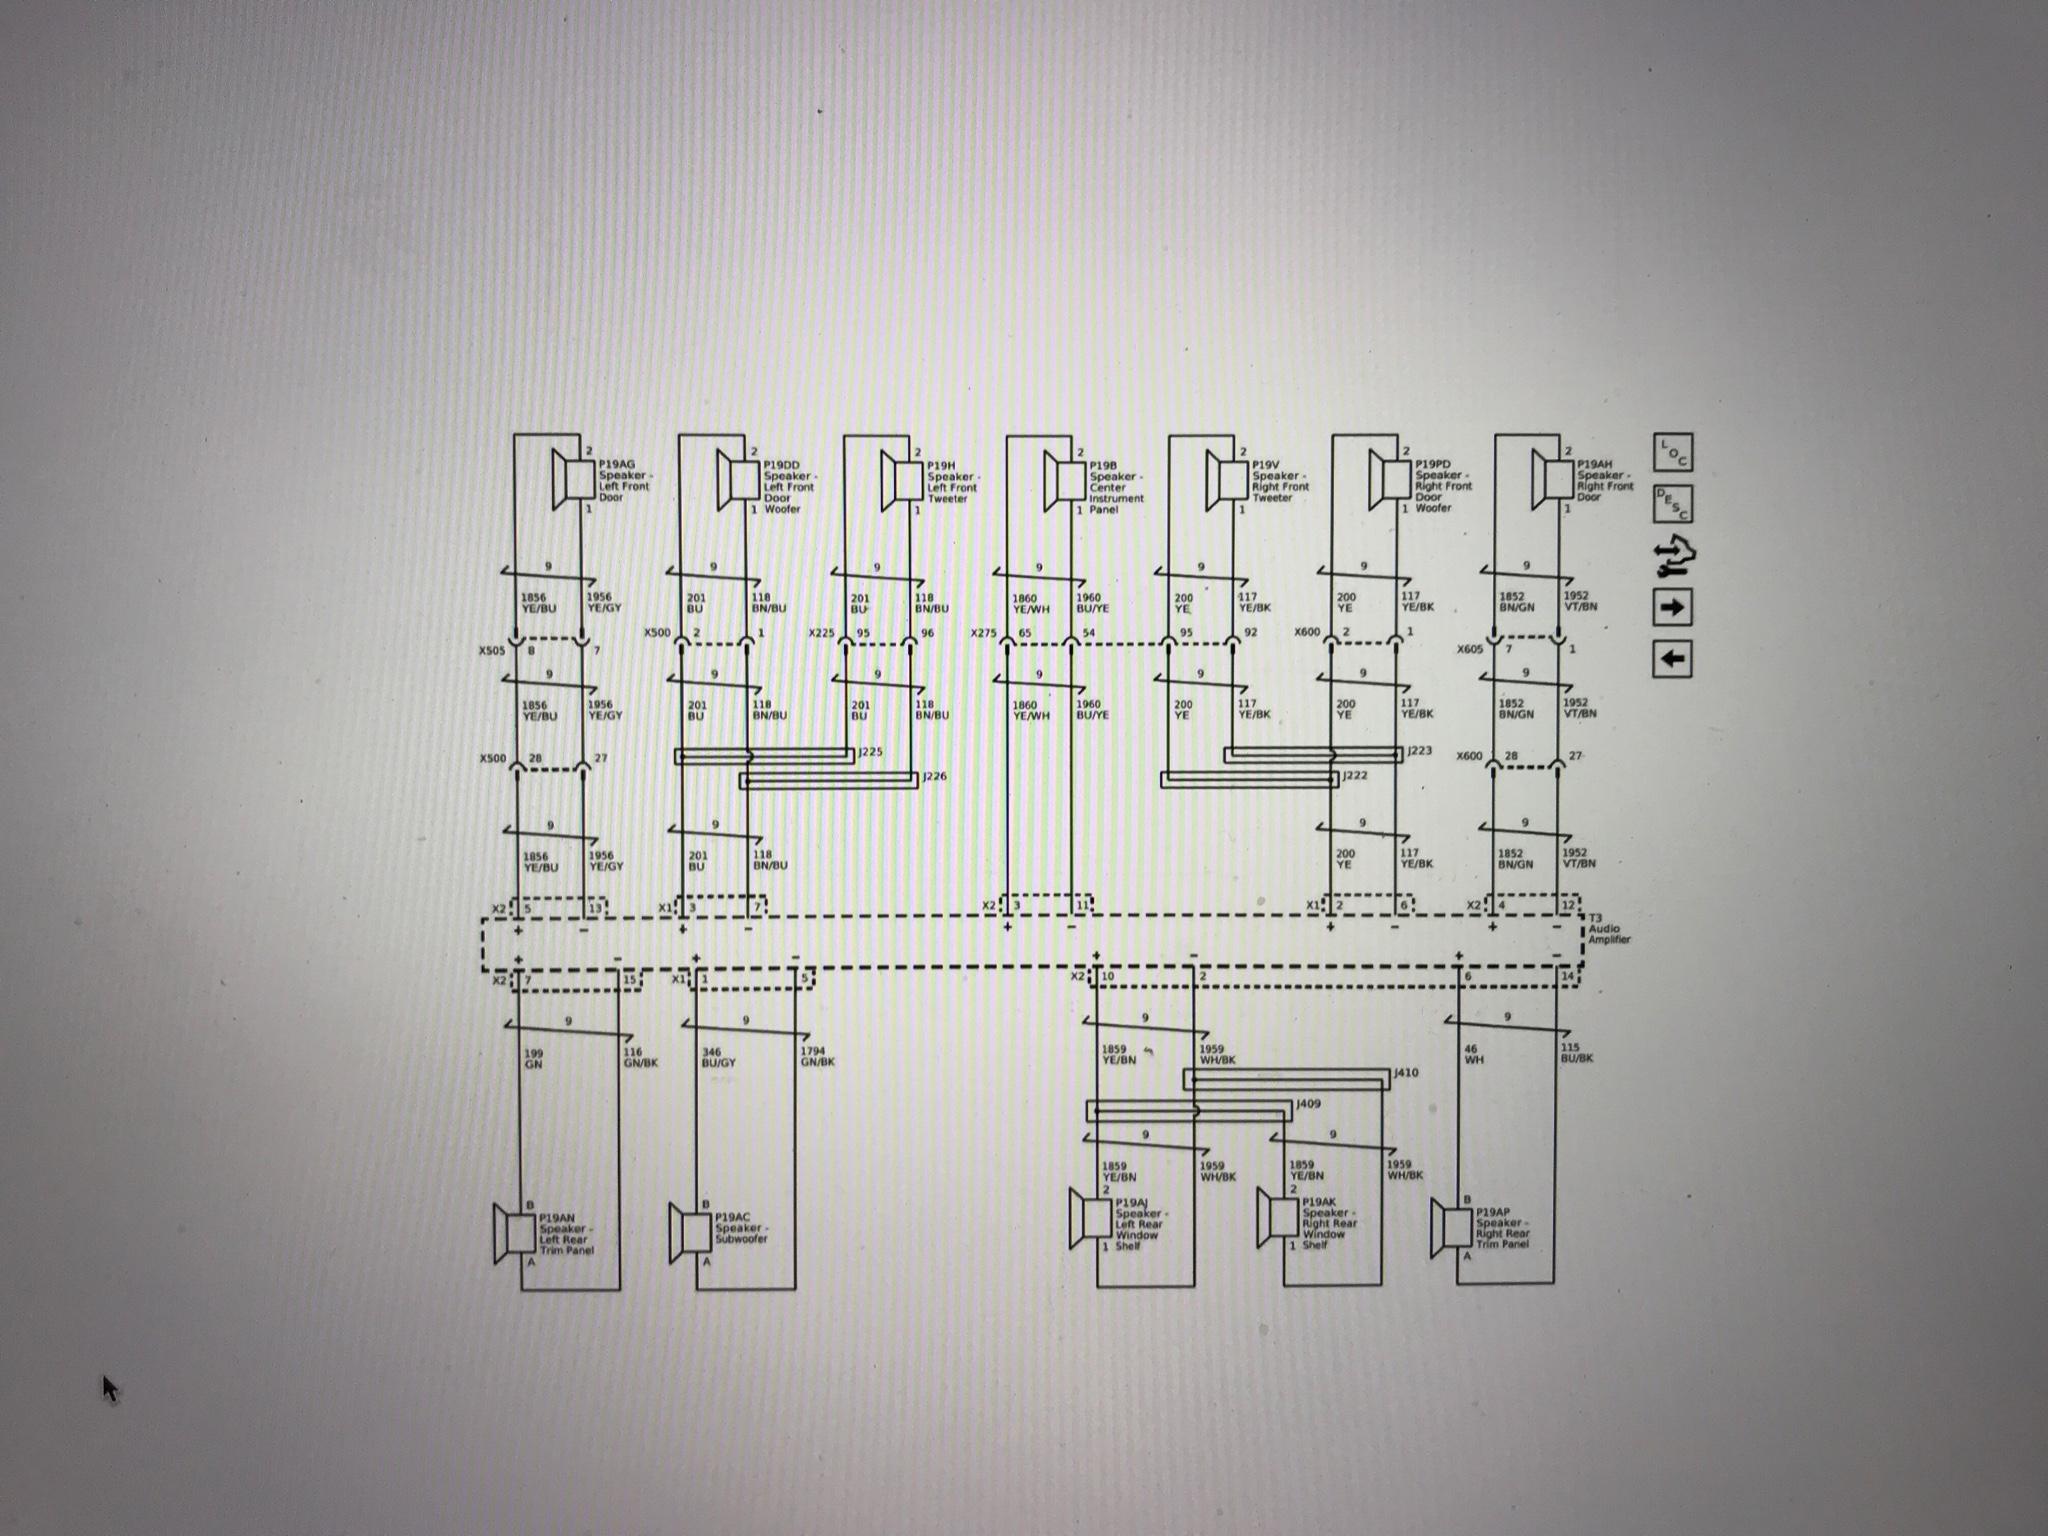 d89ed3add67f5f5b11228a3050289f43 Cadillac Ats Opener Wiring Diagram on mitsubishi starion wiring diagram, chrysler crossfire wiring diagram, lexus gx wiring diagram, nissan leaf wiring diagram, hyundai veloster wiring diagram, nissan 370z wiring diagram, kia forte wiring diagram, dodge challenger wiring diagram, subaru tribeca wiring diagram, chevrolet volt wiring diagram, hyundai veracruz wiring diagram, bmw x3 wiring diagram, porsche cayenne wiring diagram, volkswagen golf wiring diagram, mitsubishi endeavor wiring diagram, infiniti g37 wiring diagram, pontiac fiero wiring diagram, ford flex wiring diagram, tesla model s wiring diagram, ford thunderbird wiring diagram,